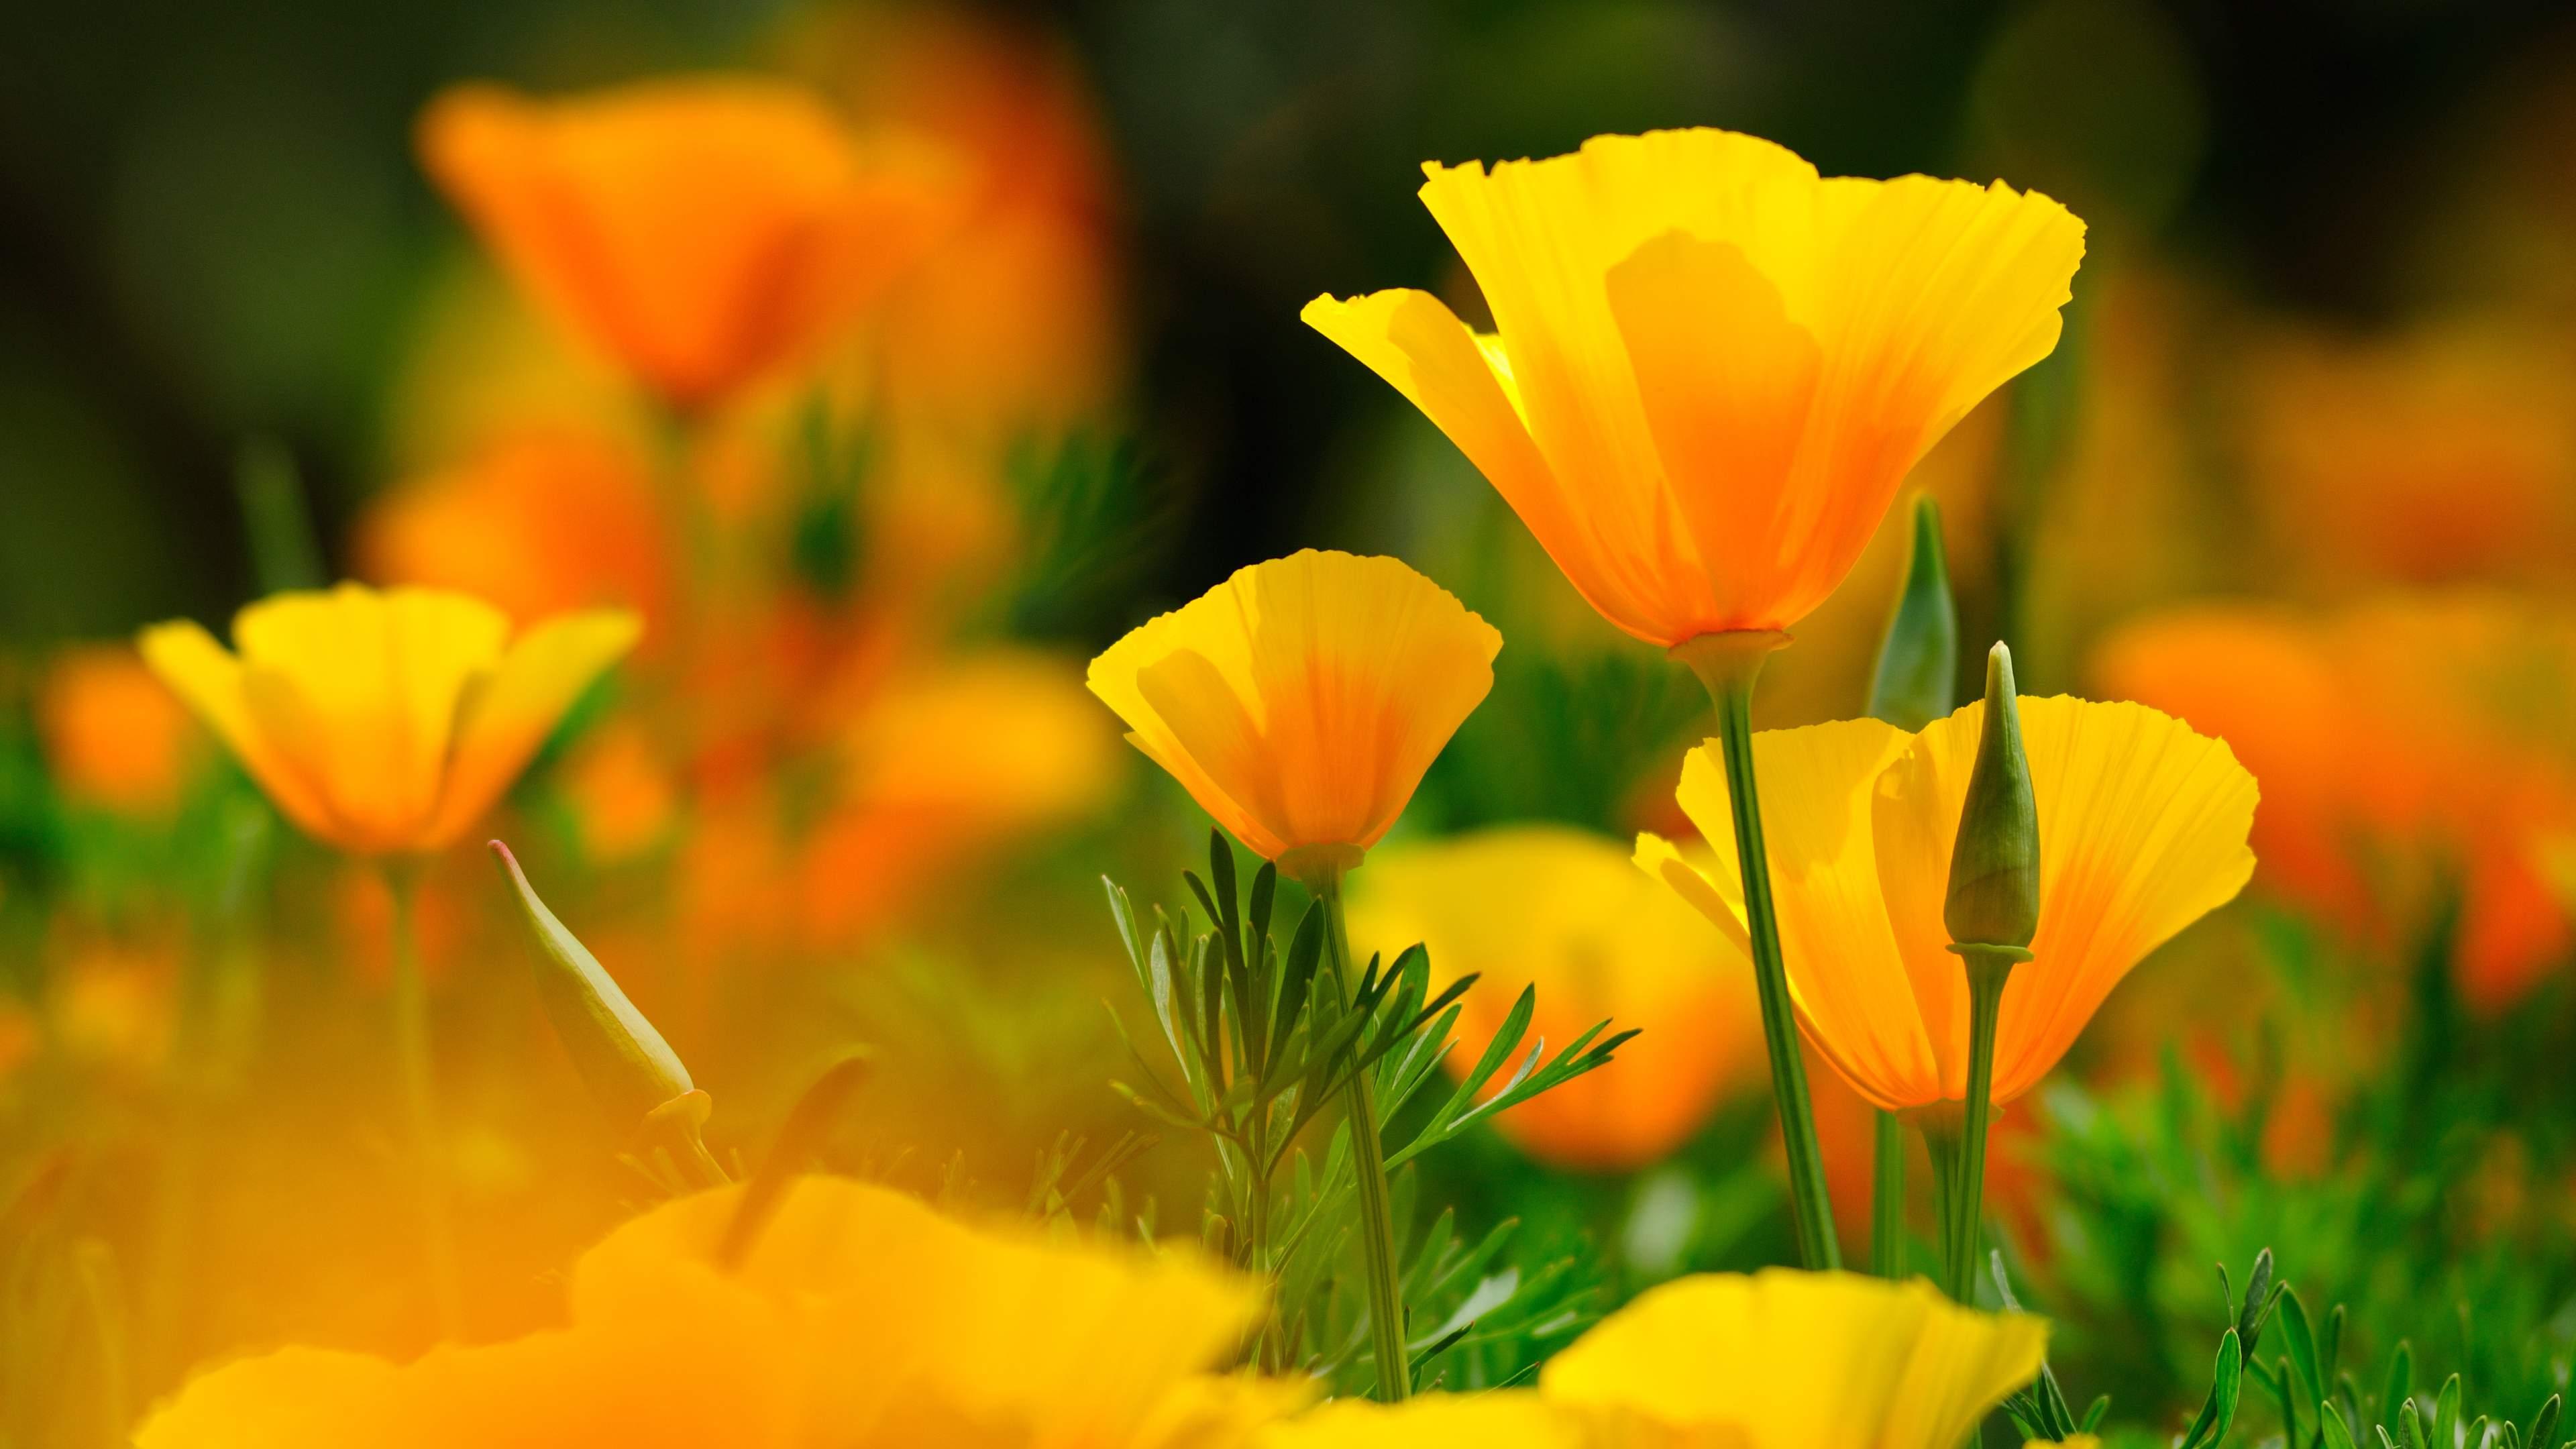 Flowers 4K Wallpapers - Top Free Flowers 4K Backgrounds ...